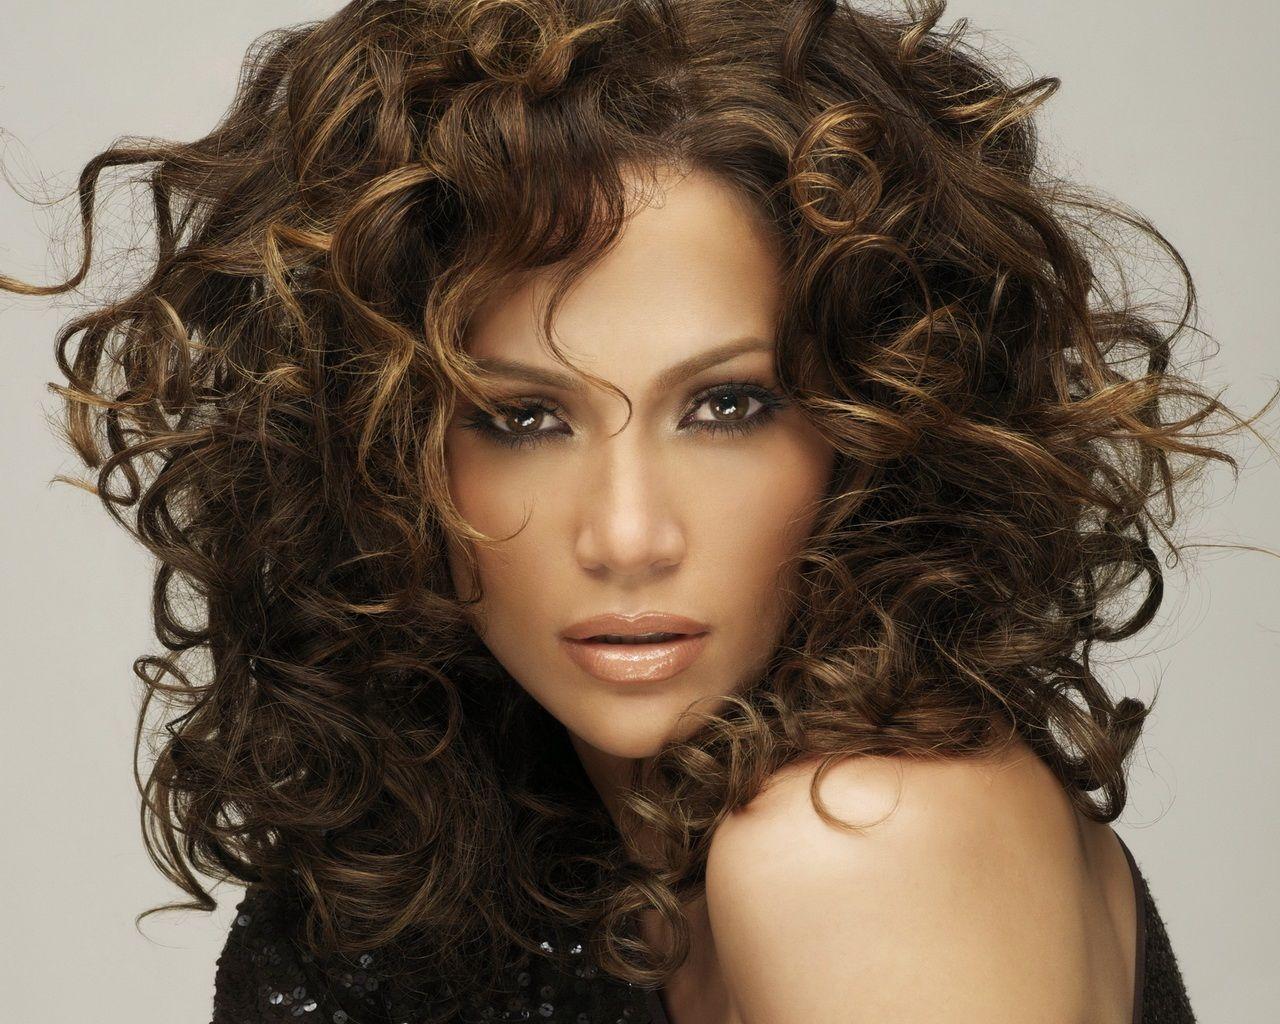 Jennifer lopez jlo hair highlights isalon celebrity pins jennifer lopez jlo hair highlights pmusecretfo Gallery